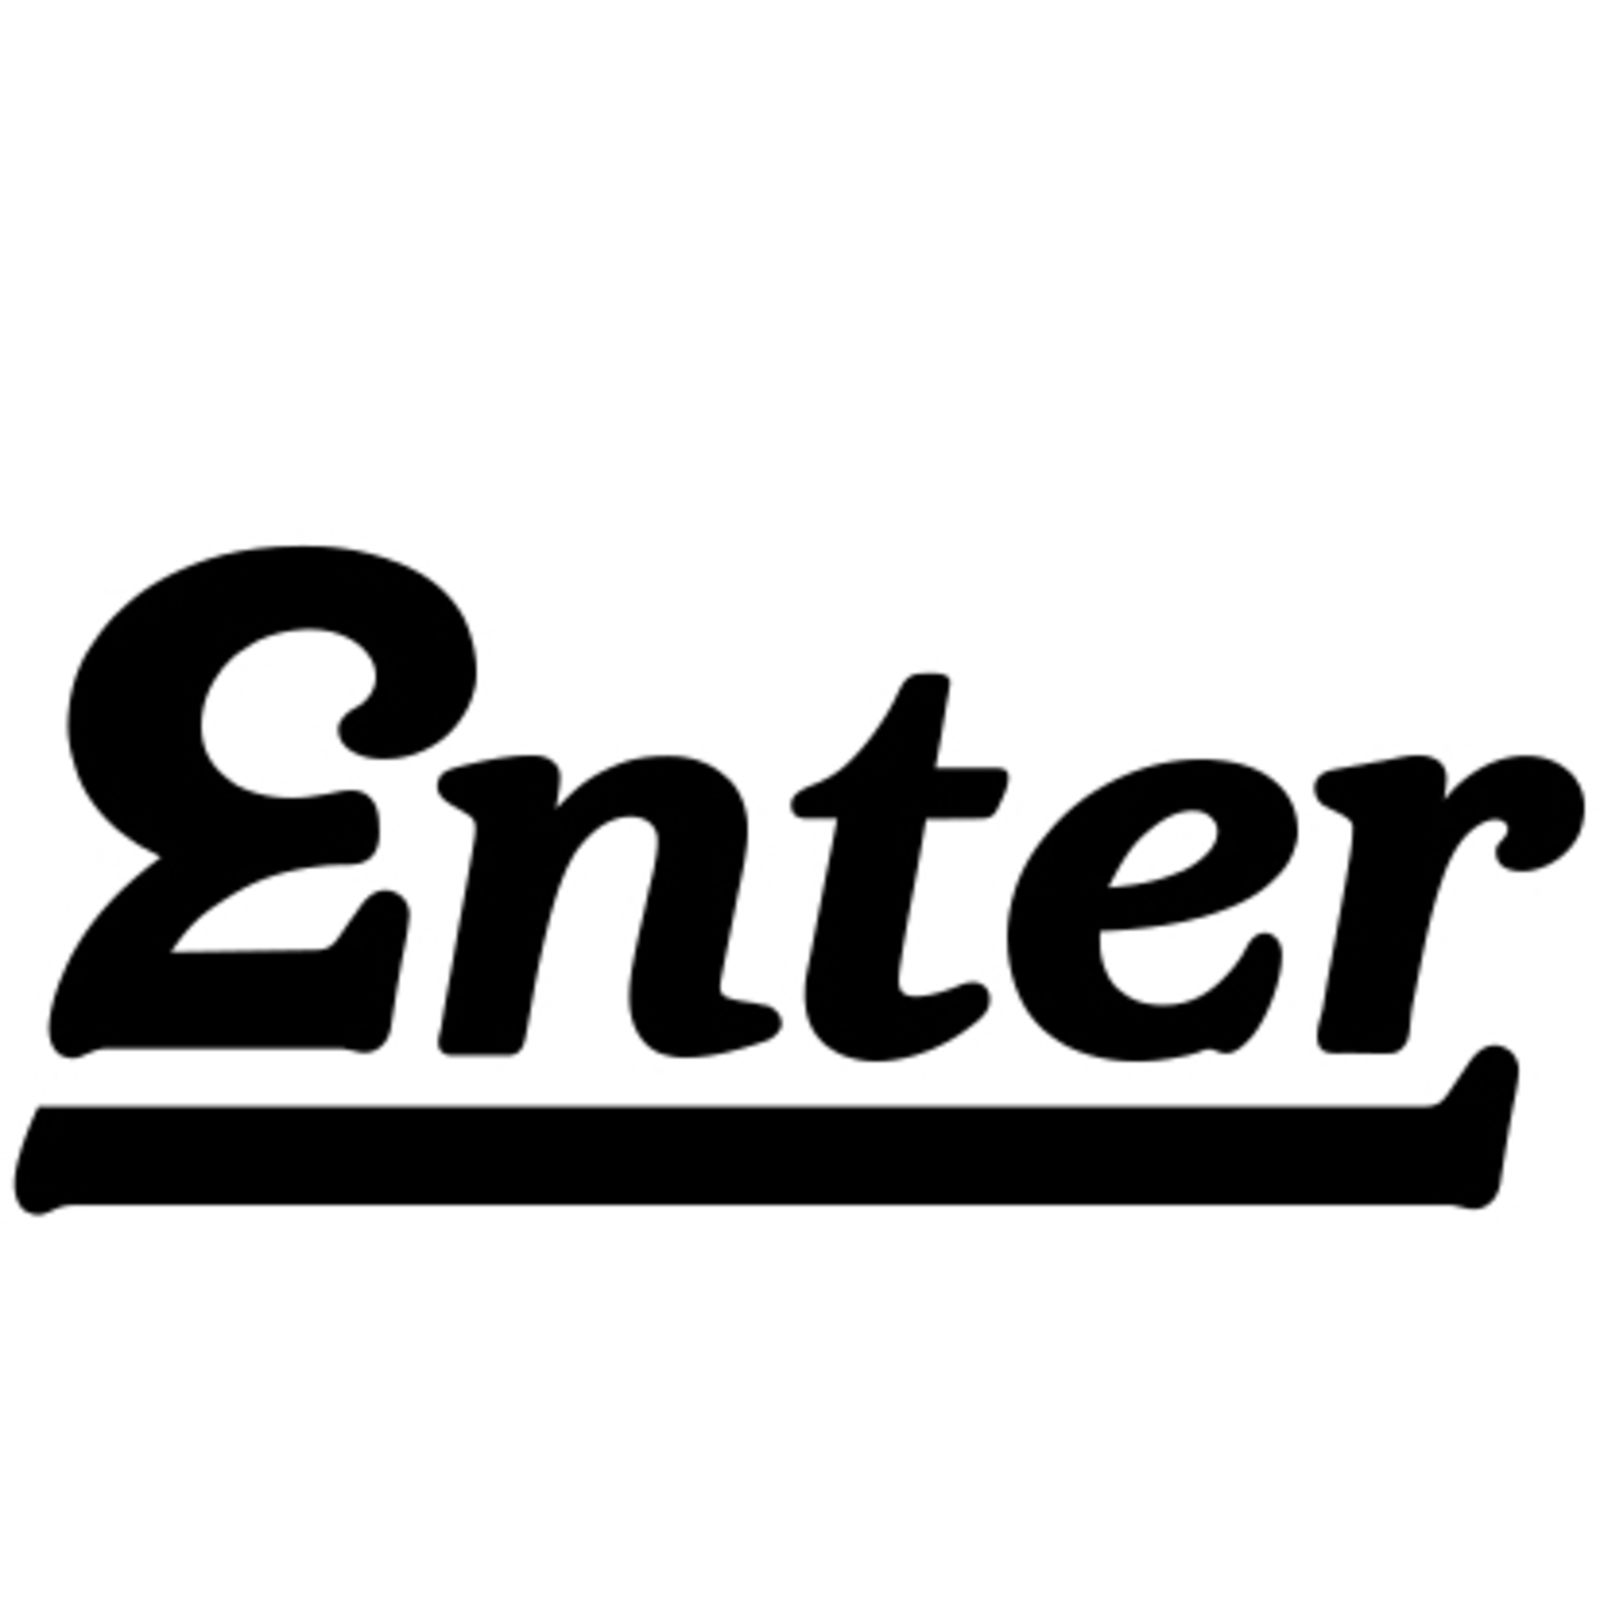 ENTER (Image 1)